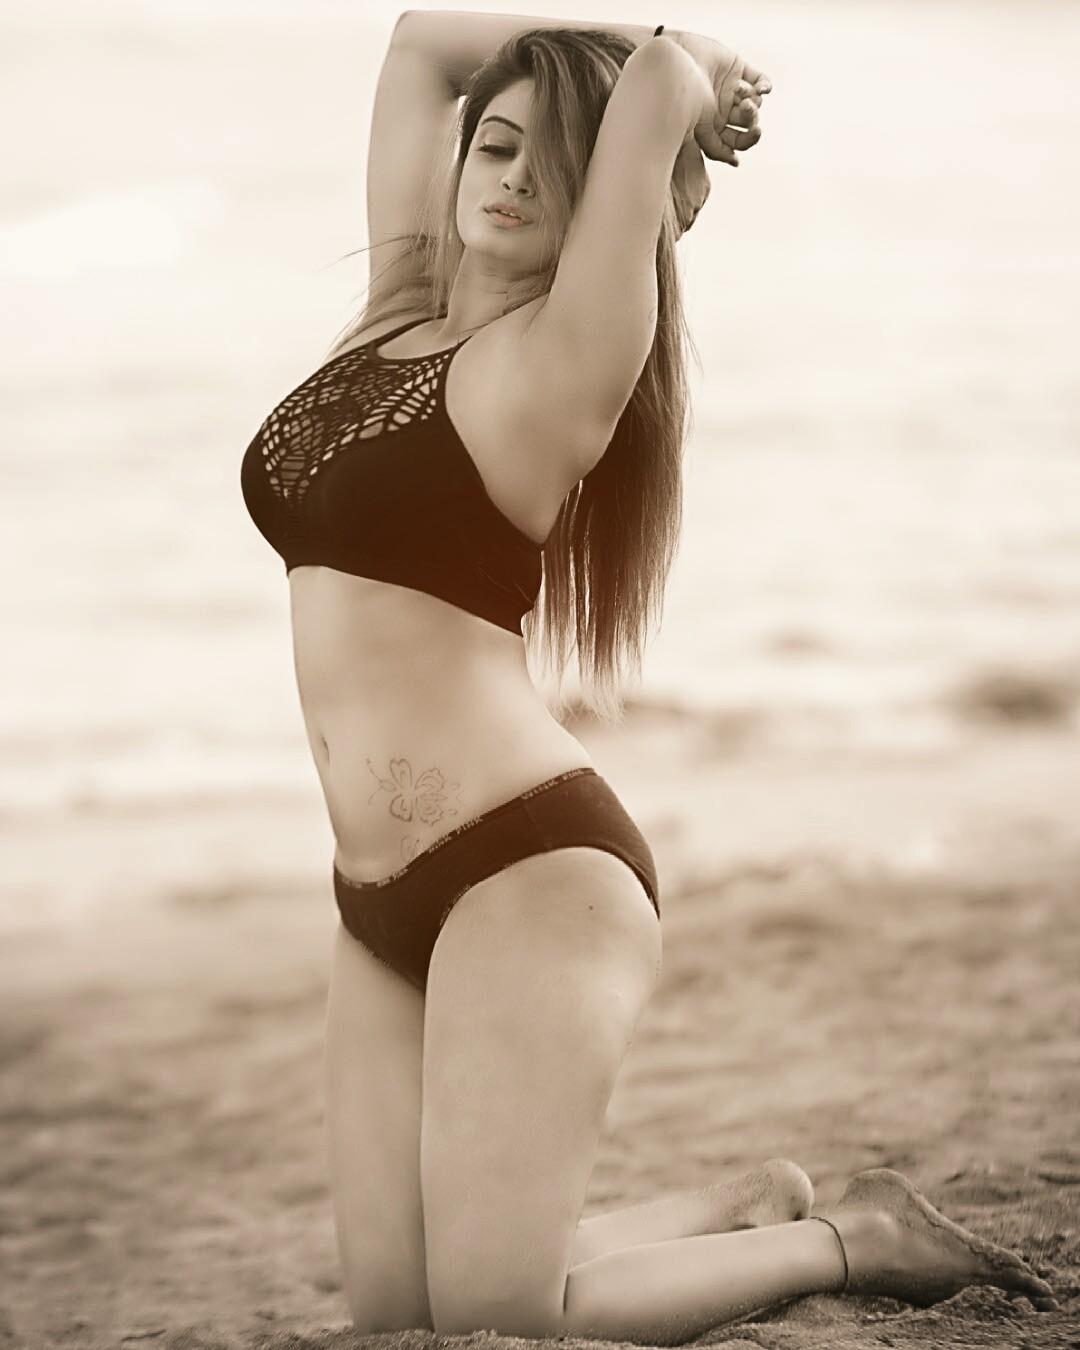 Indian Model Twinkle Kapoor Hot Instagram Photos